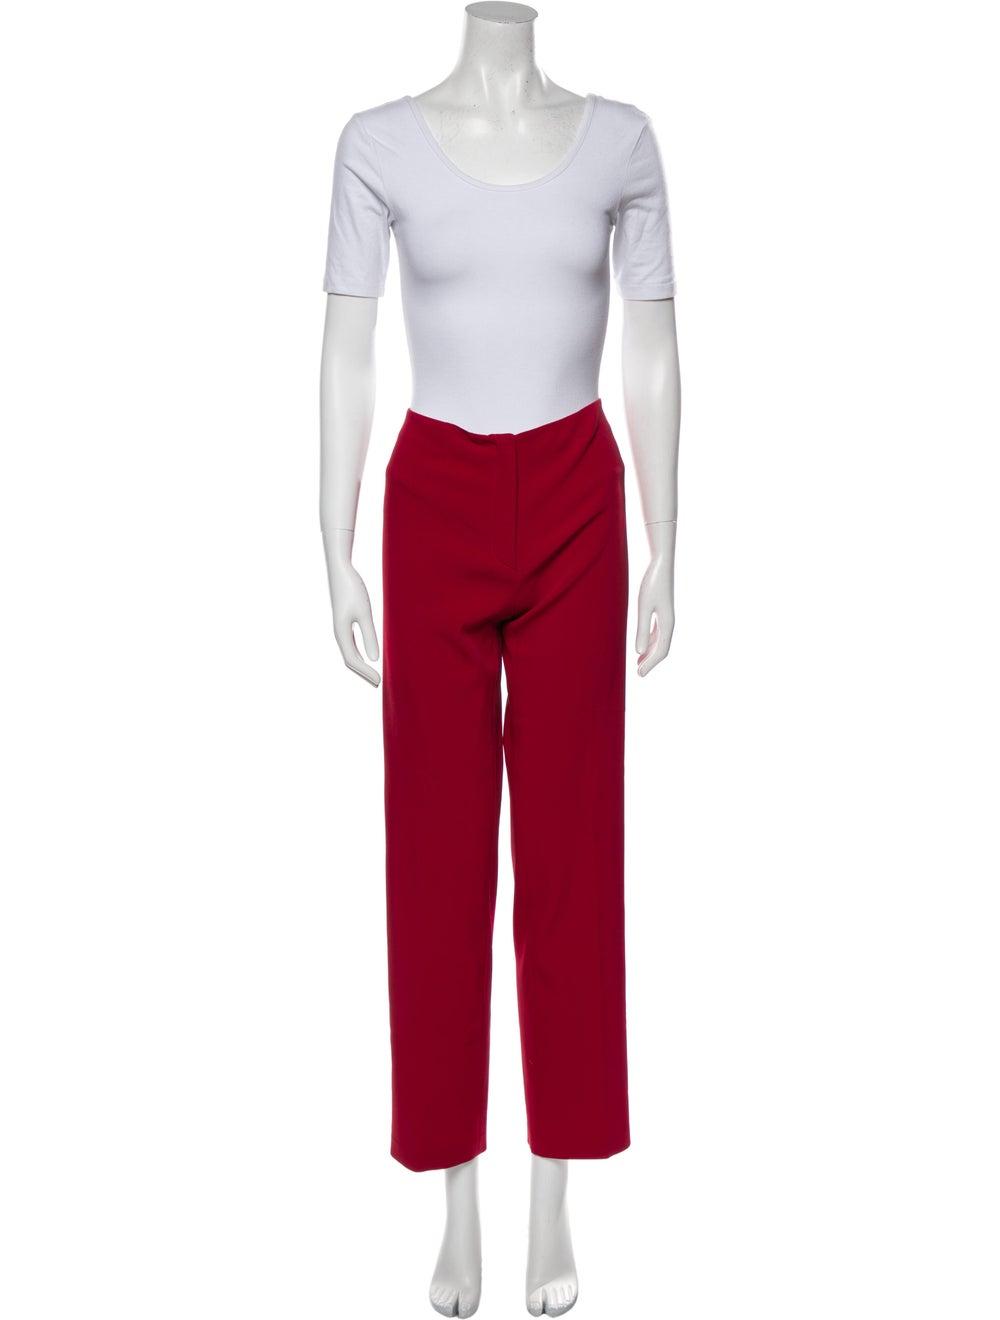 Prada Vintage 1990's Pant Set Red - image 4